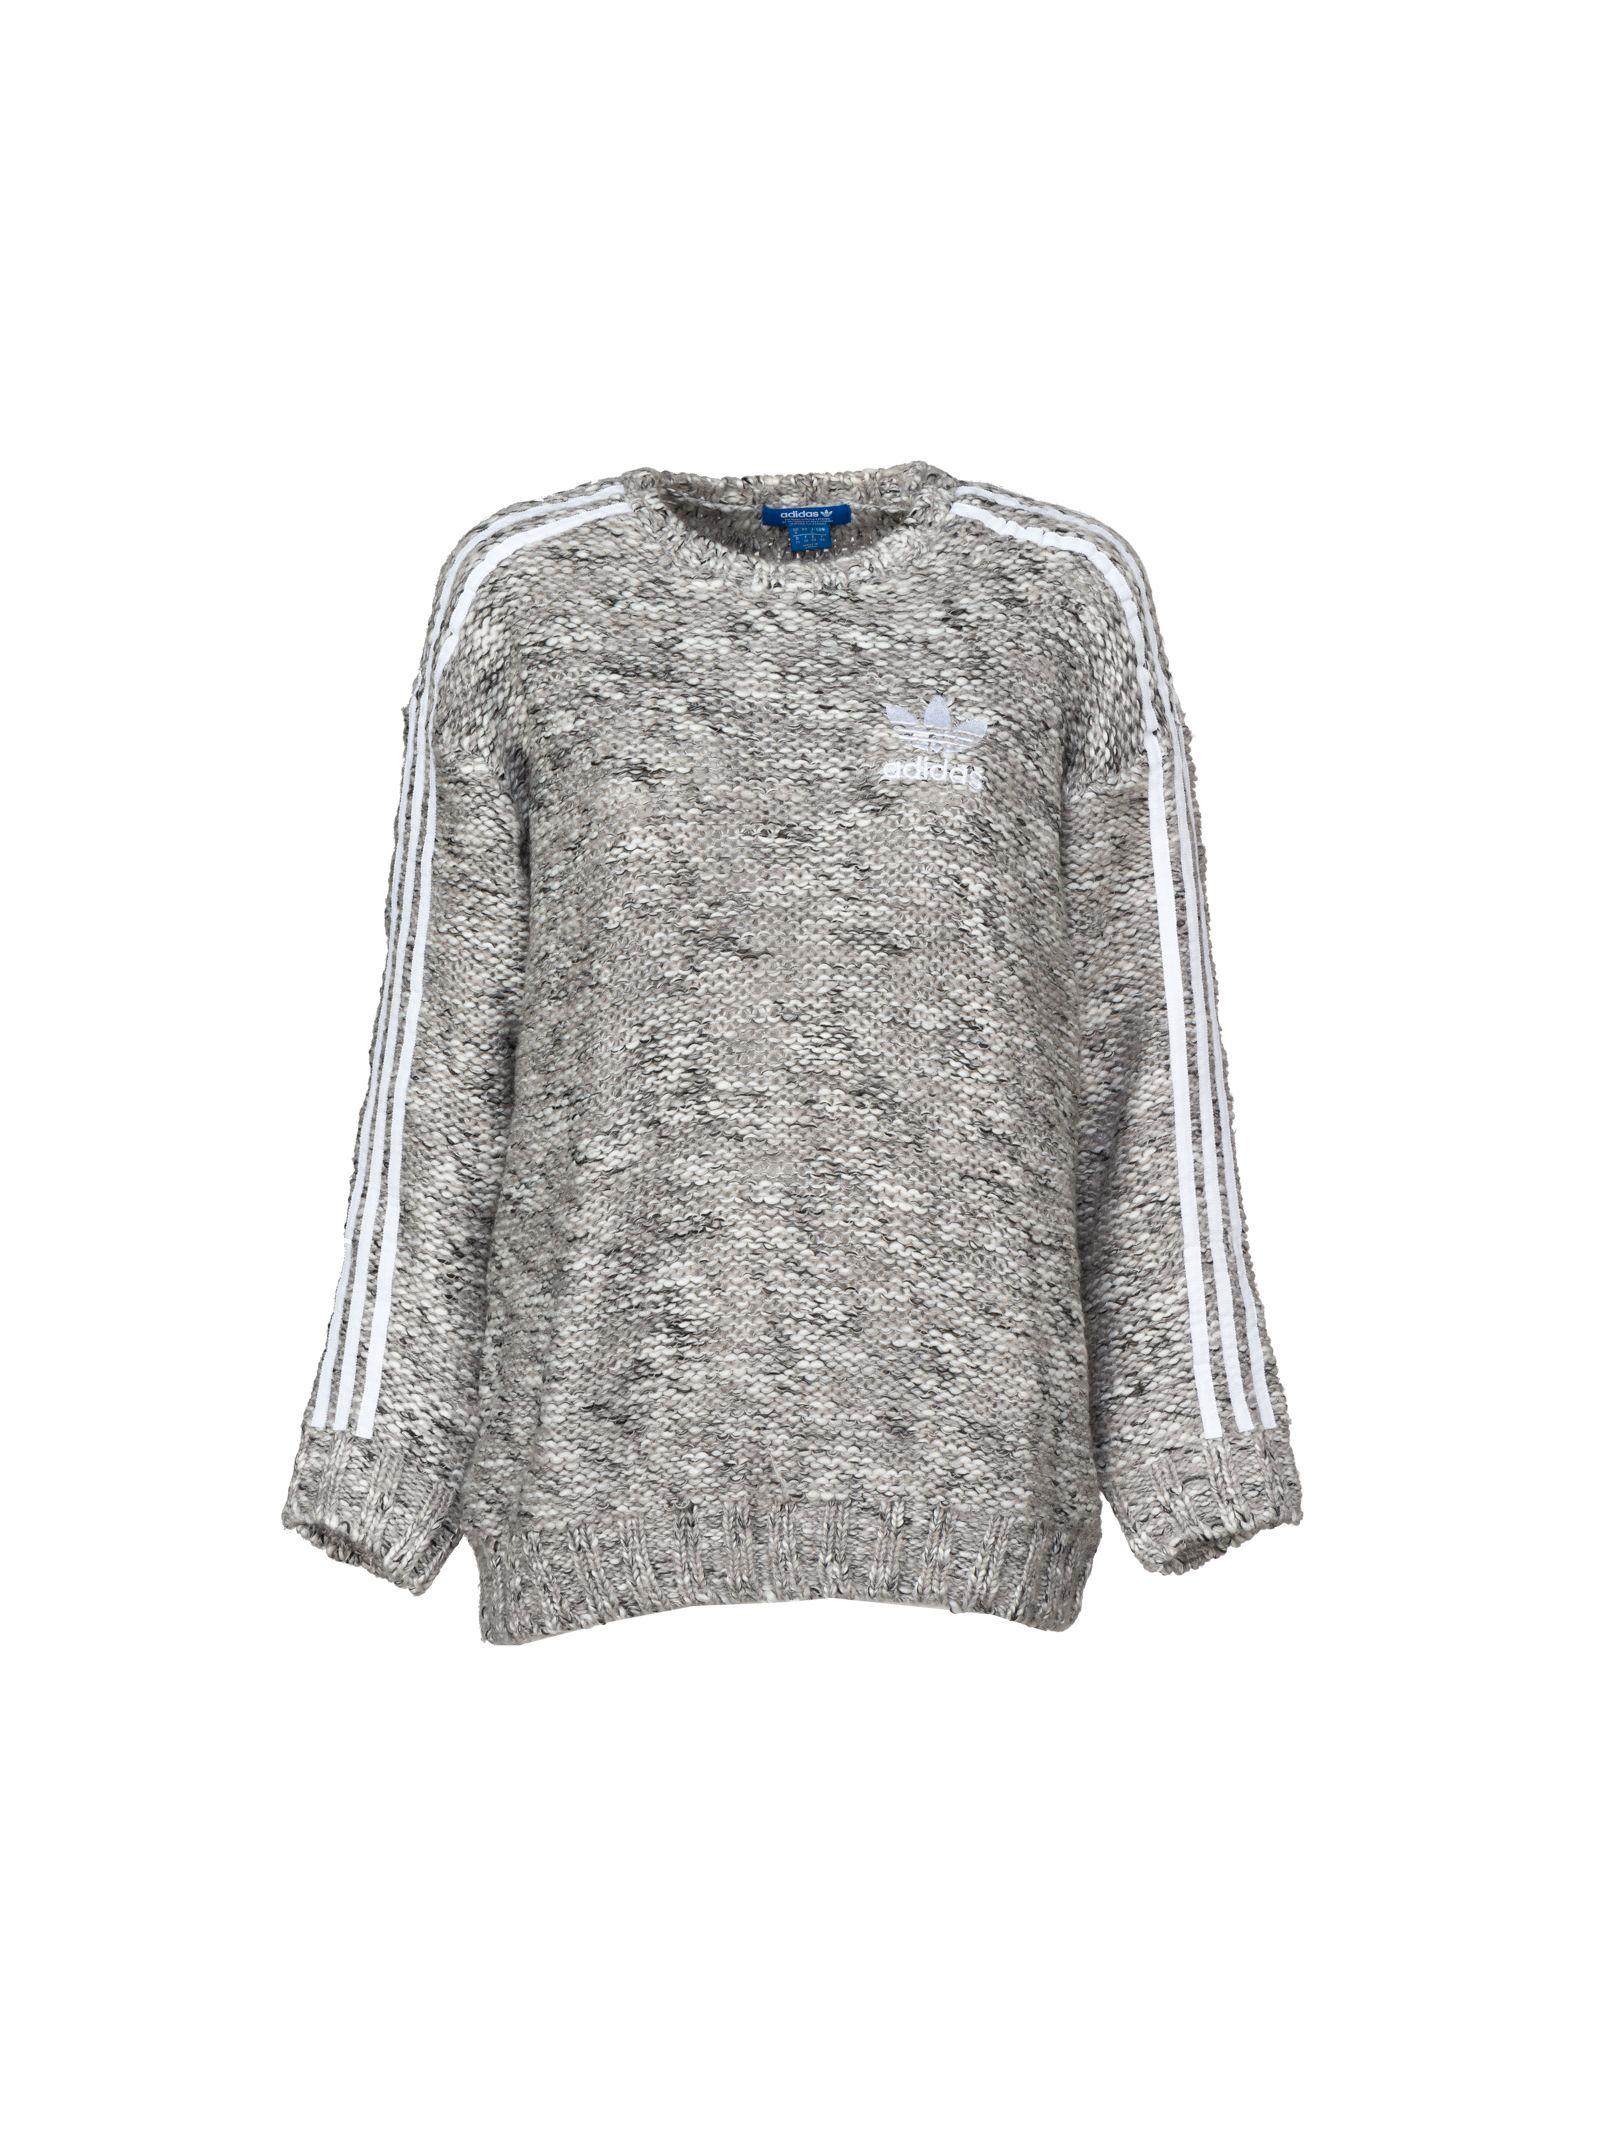 Adidas Originals Chunky Sweater